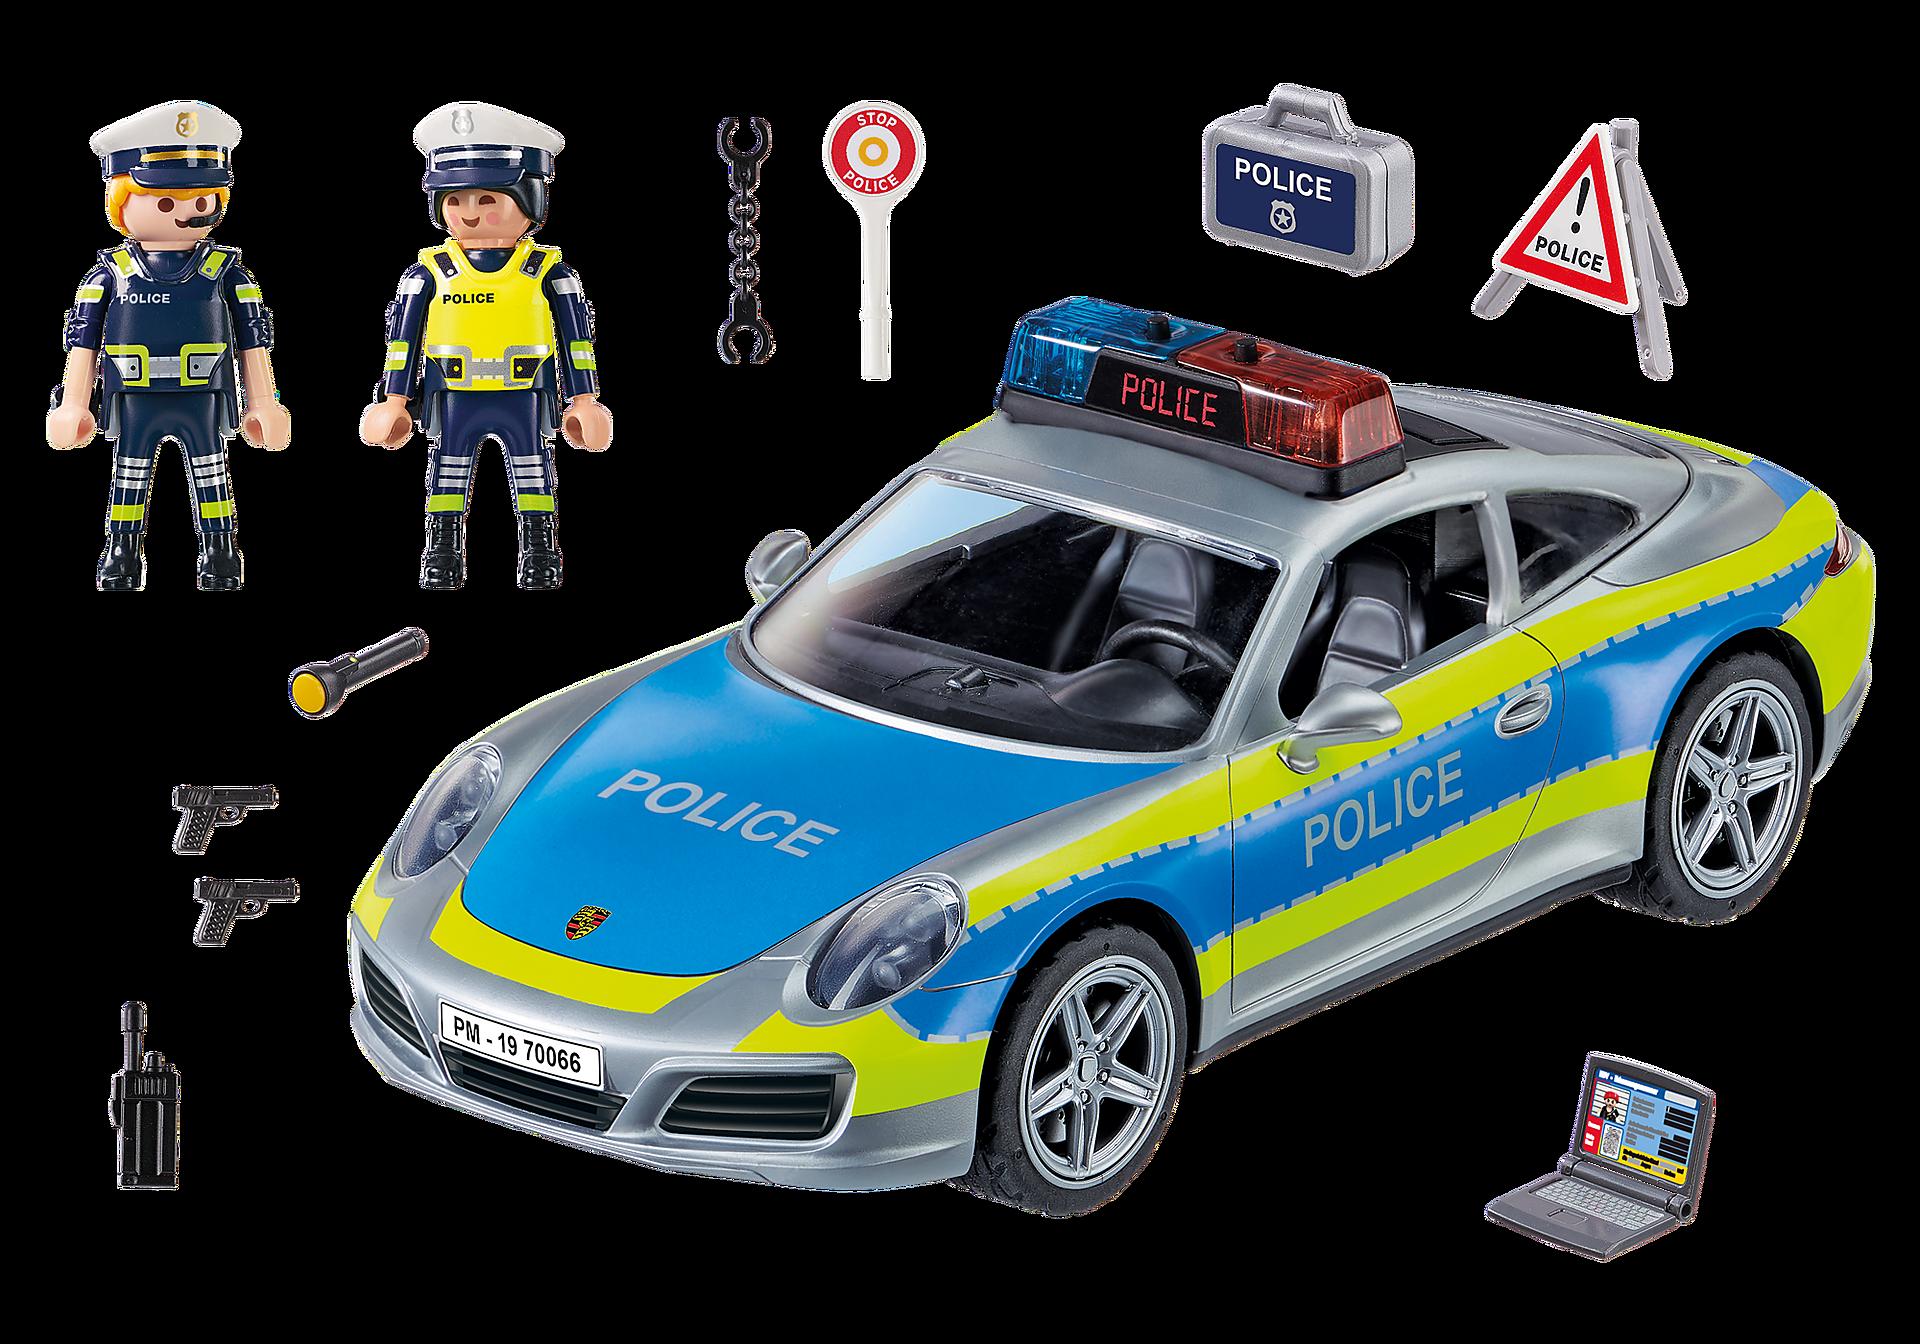 http://media.playmobil.com/i/playmobil/70066_product_box_back/Porsche 911 Carrera 4S Police - White